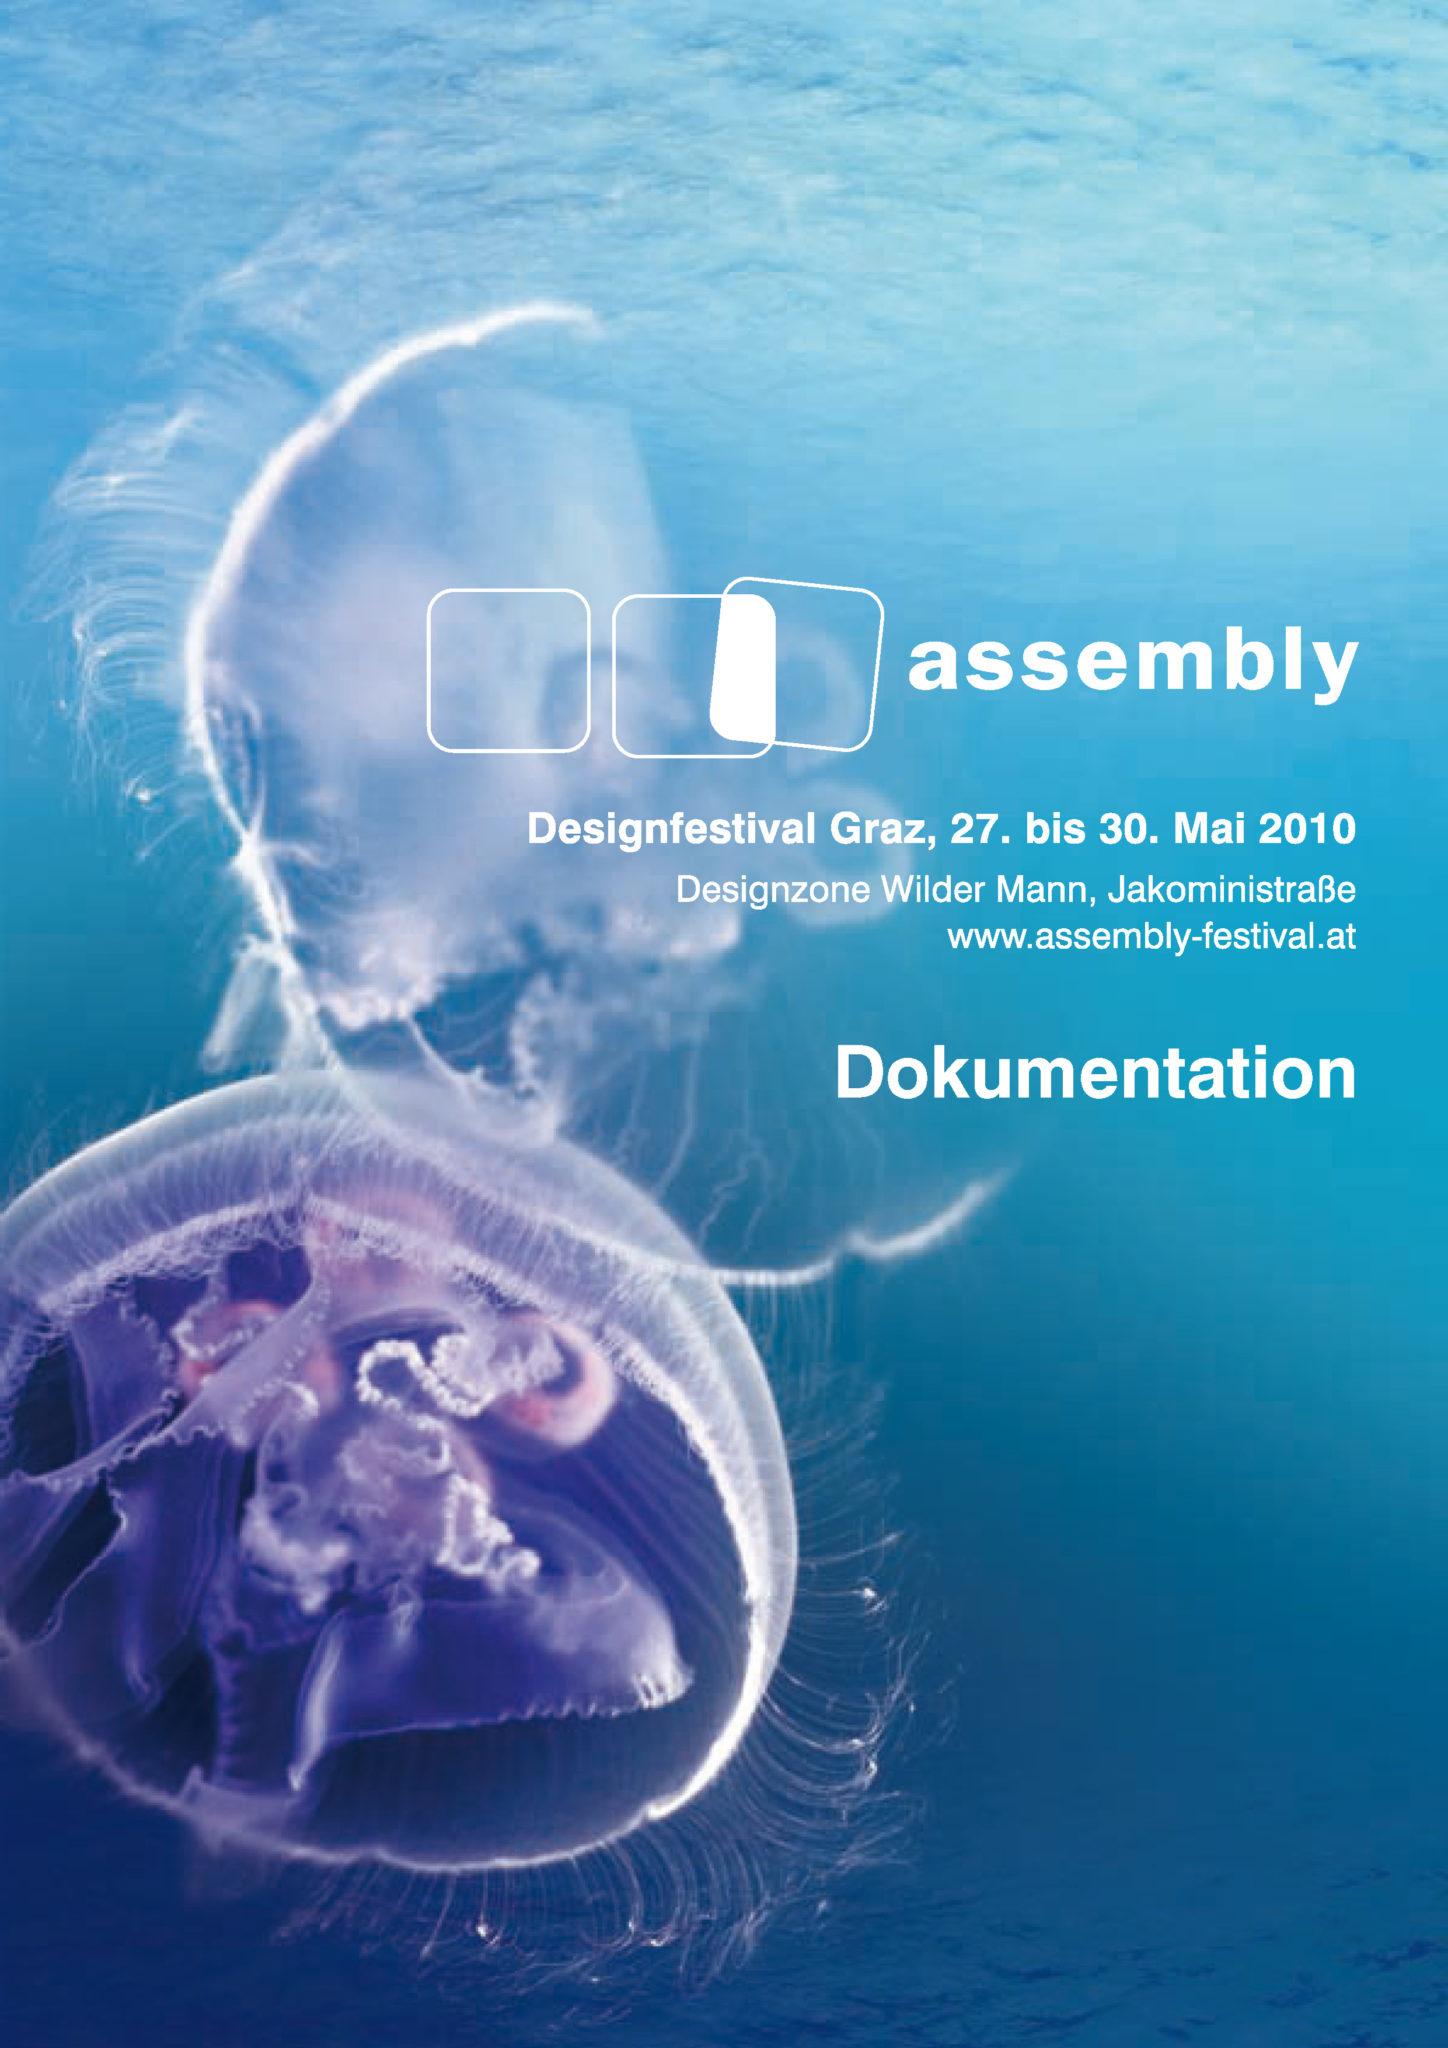 assembly Festival Archive 2010